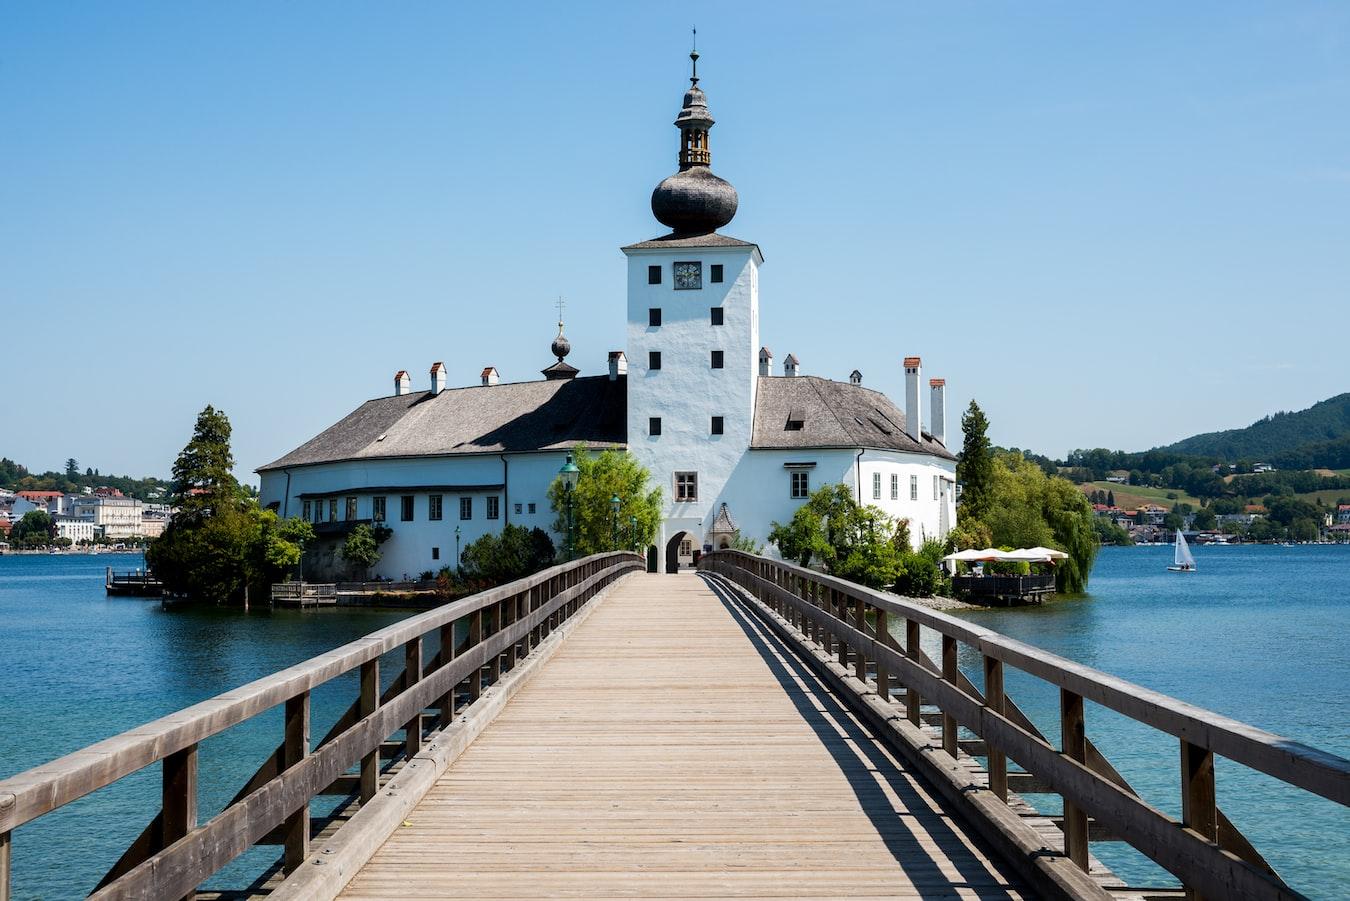 Schloss Ort Castle in Austria